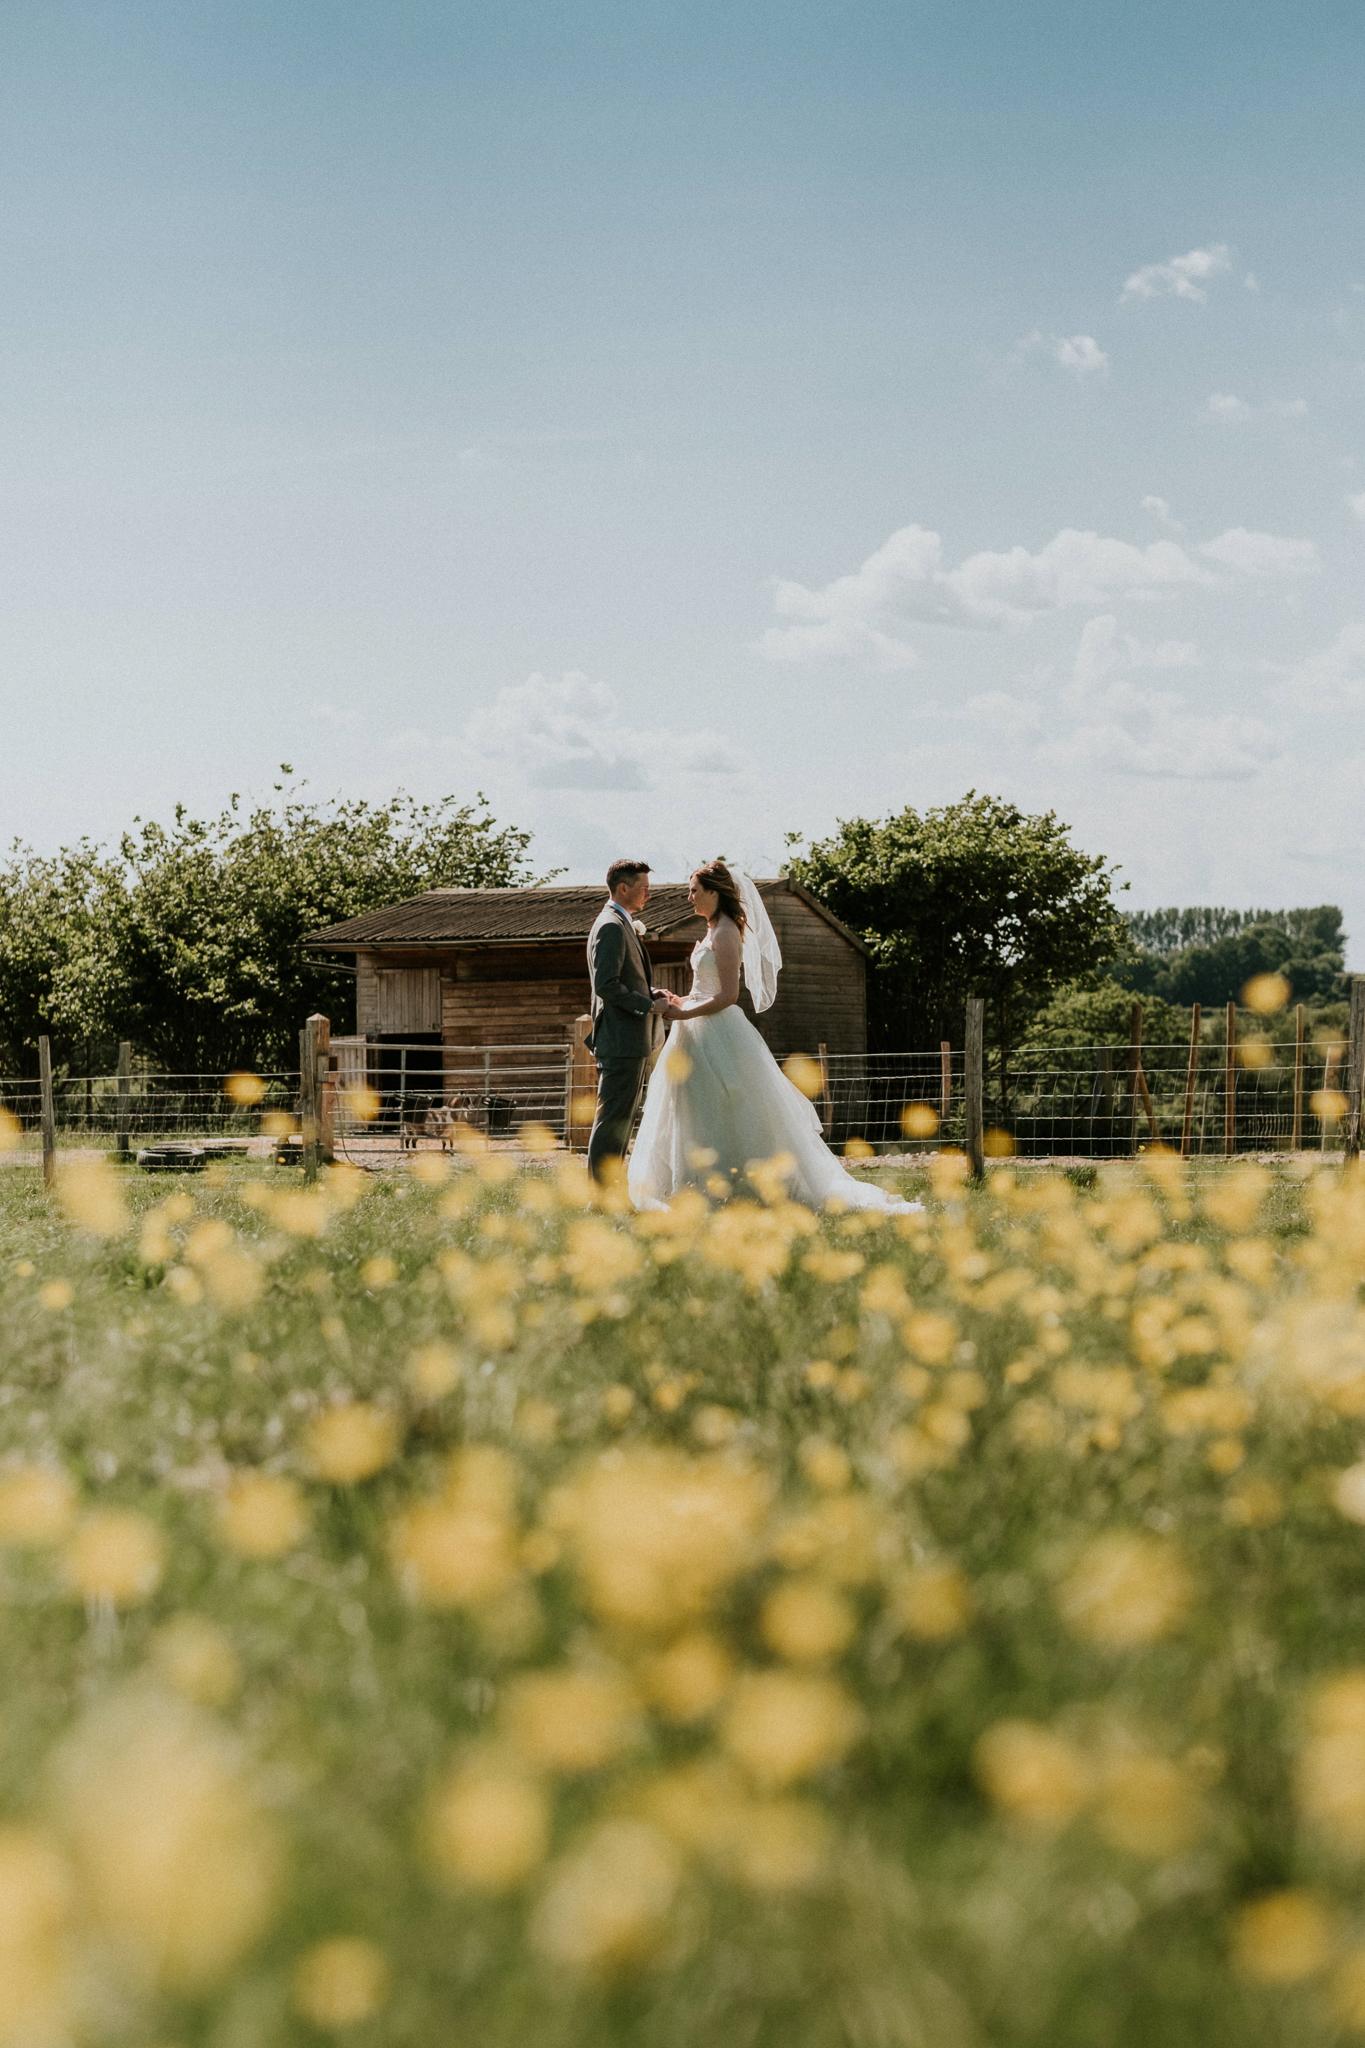 106 Sussex alternative wedding photography joanna nicole 2.jpg